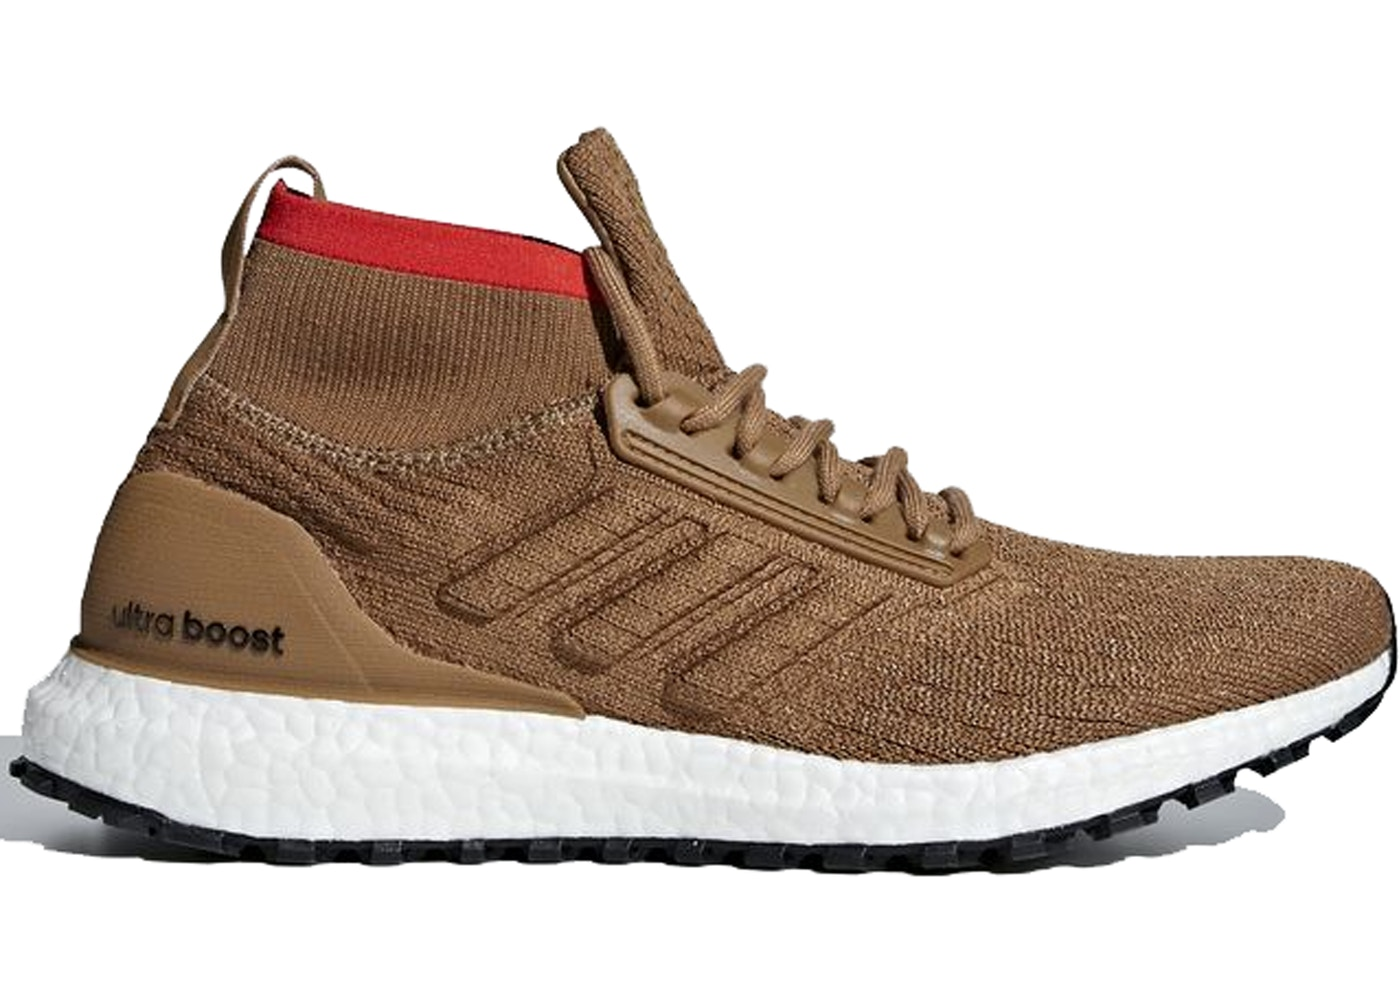 separation shoes e5a97 e9f06 adidas Ultra Boost All Terrain Raw Desert